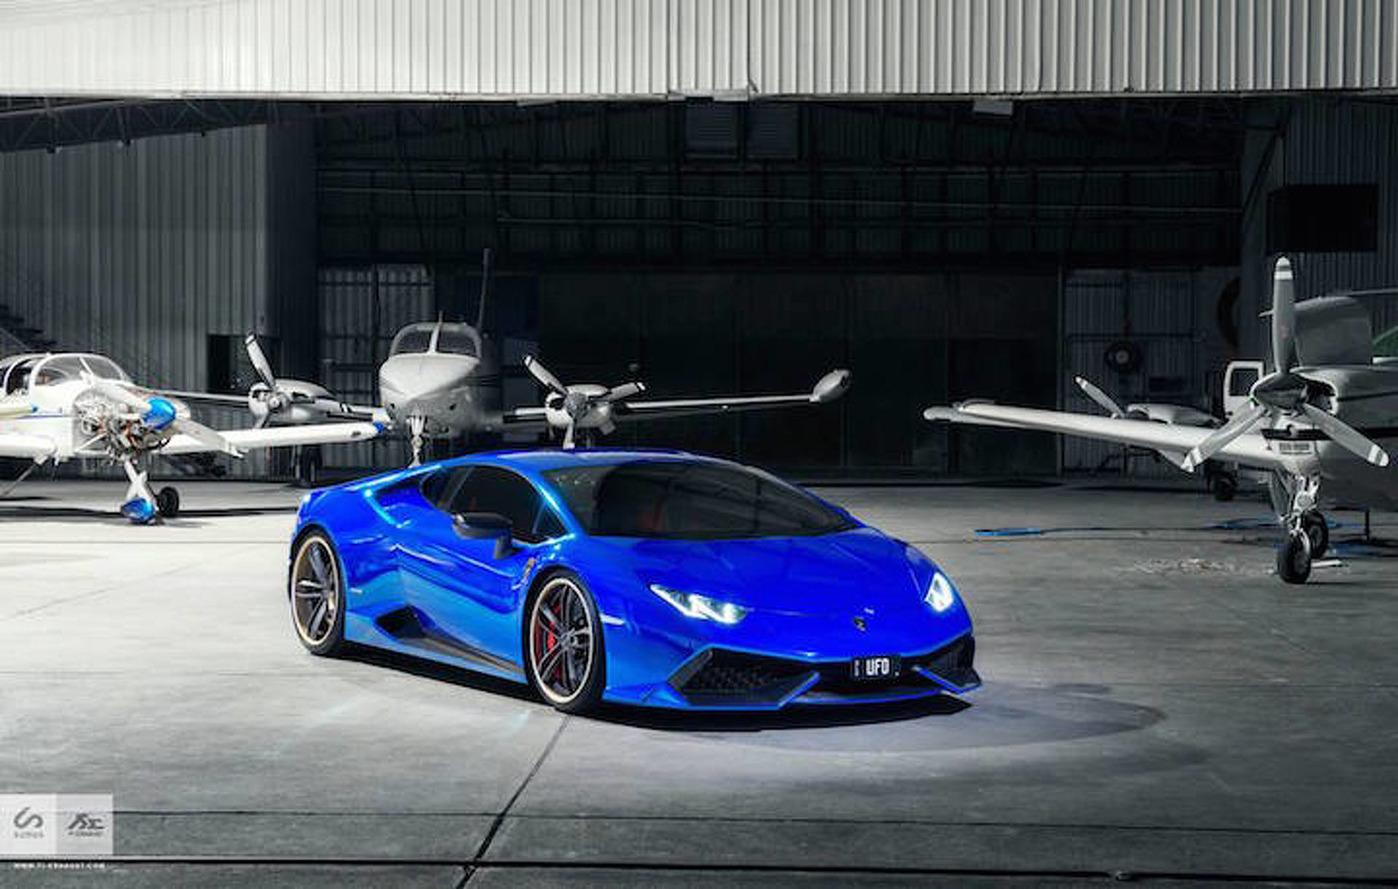 This Lamborghini Huracan In Blue Chrome Looks Crazy Good